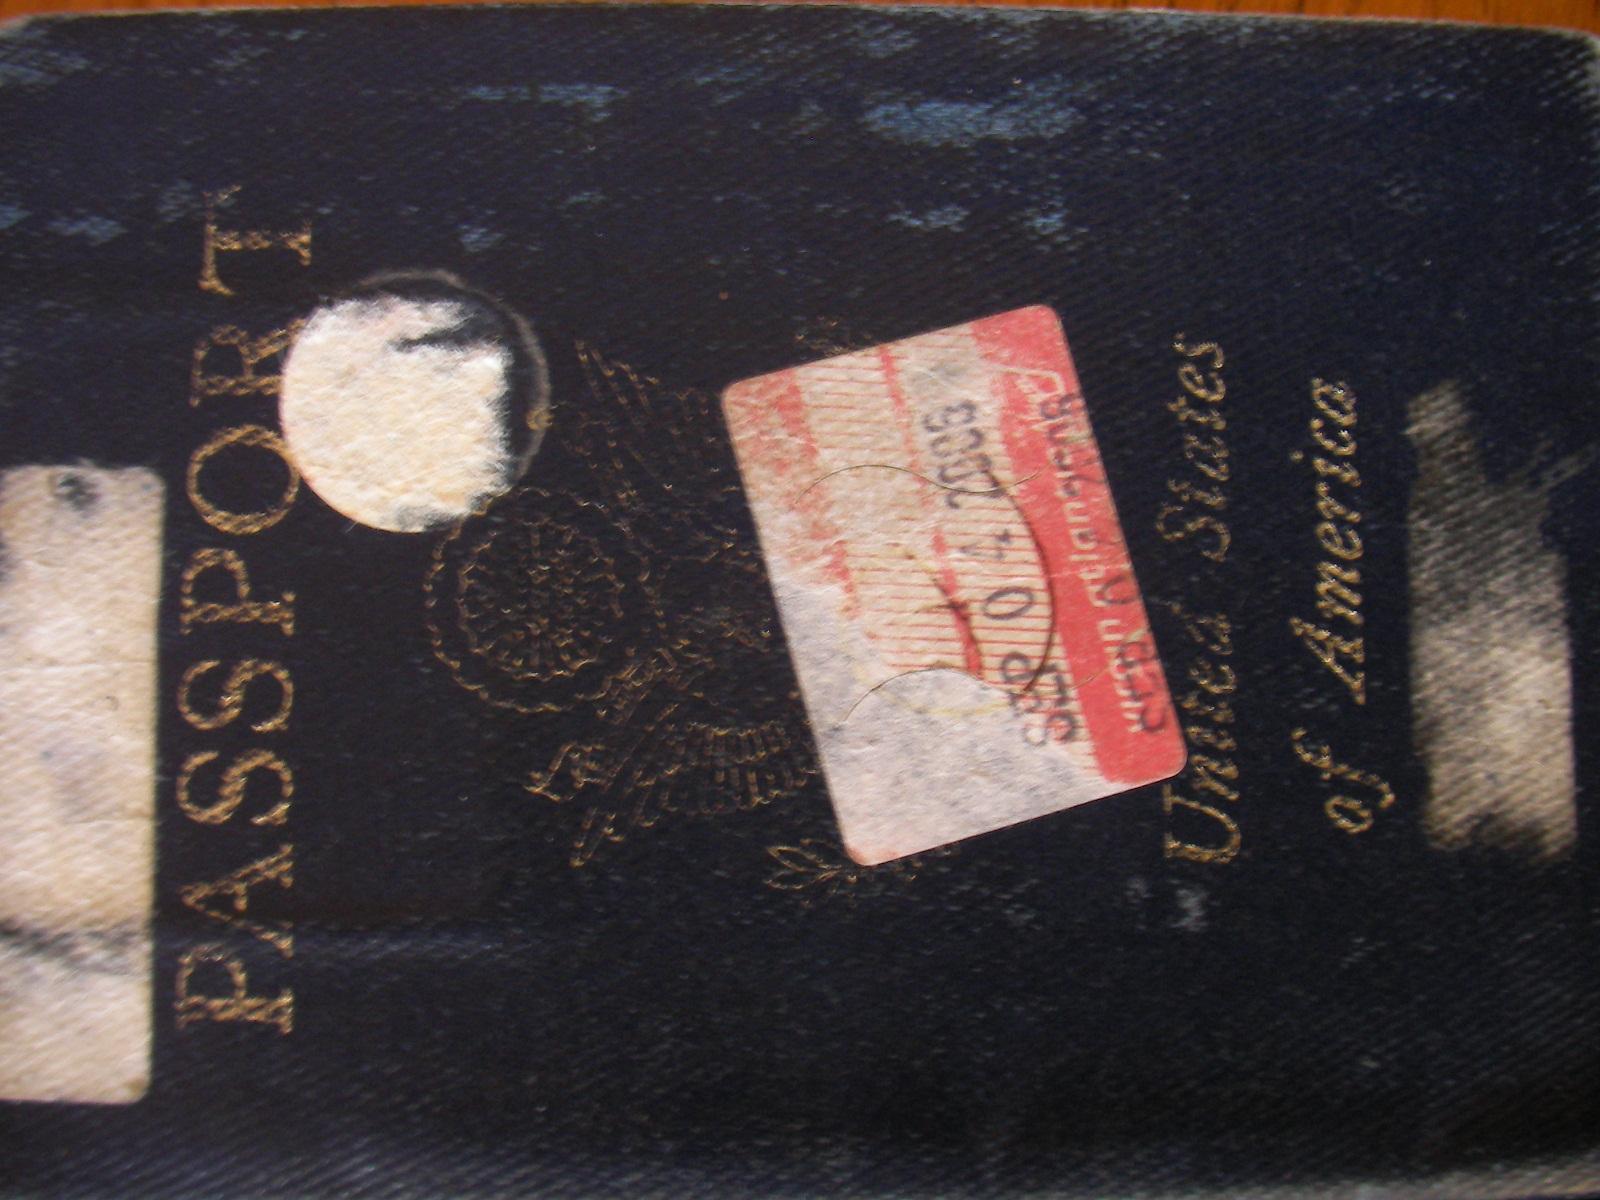 US Passport - Don't lose it